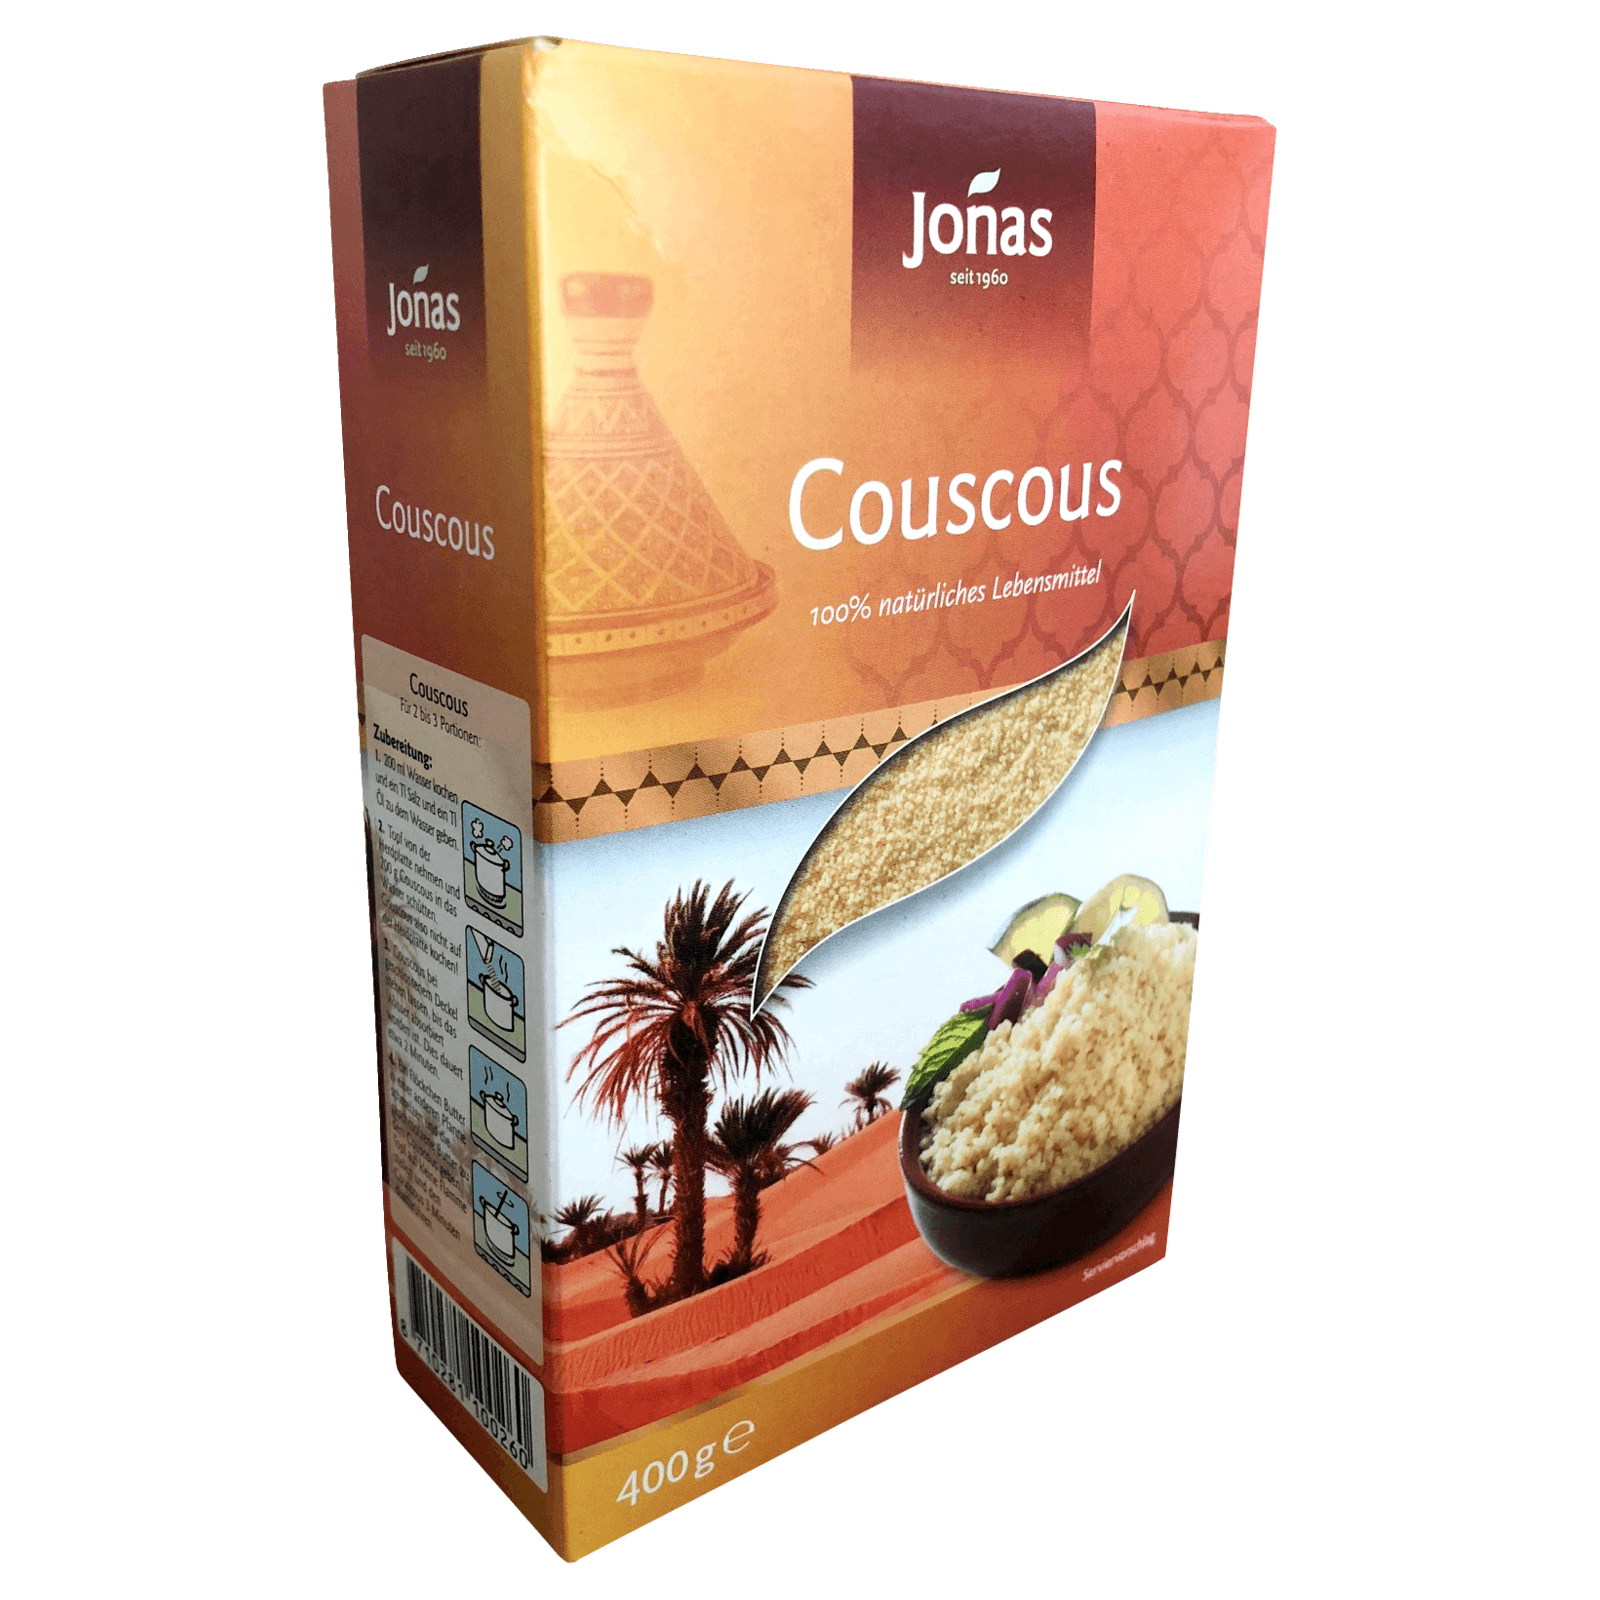 Jonas Couscous 400g